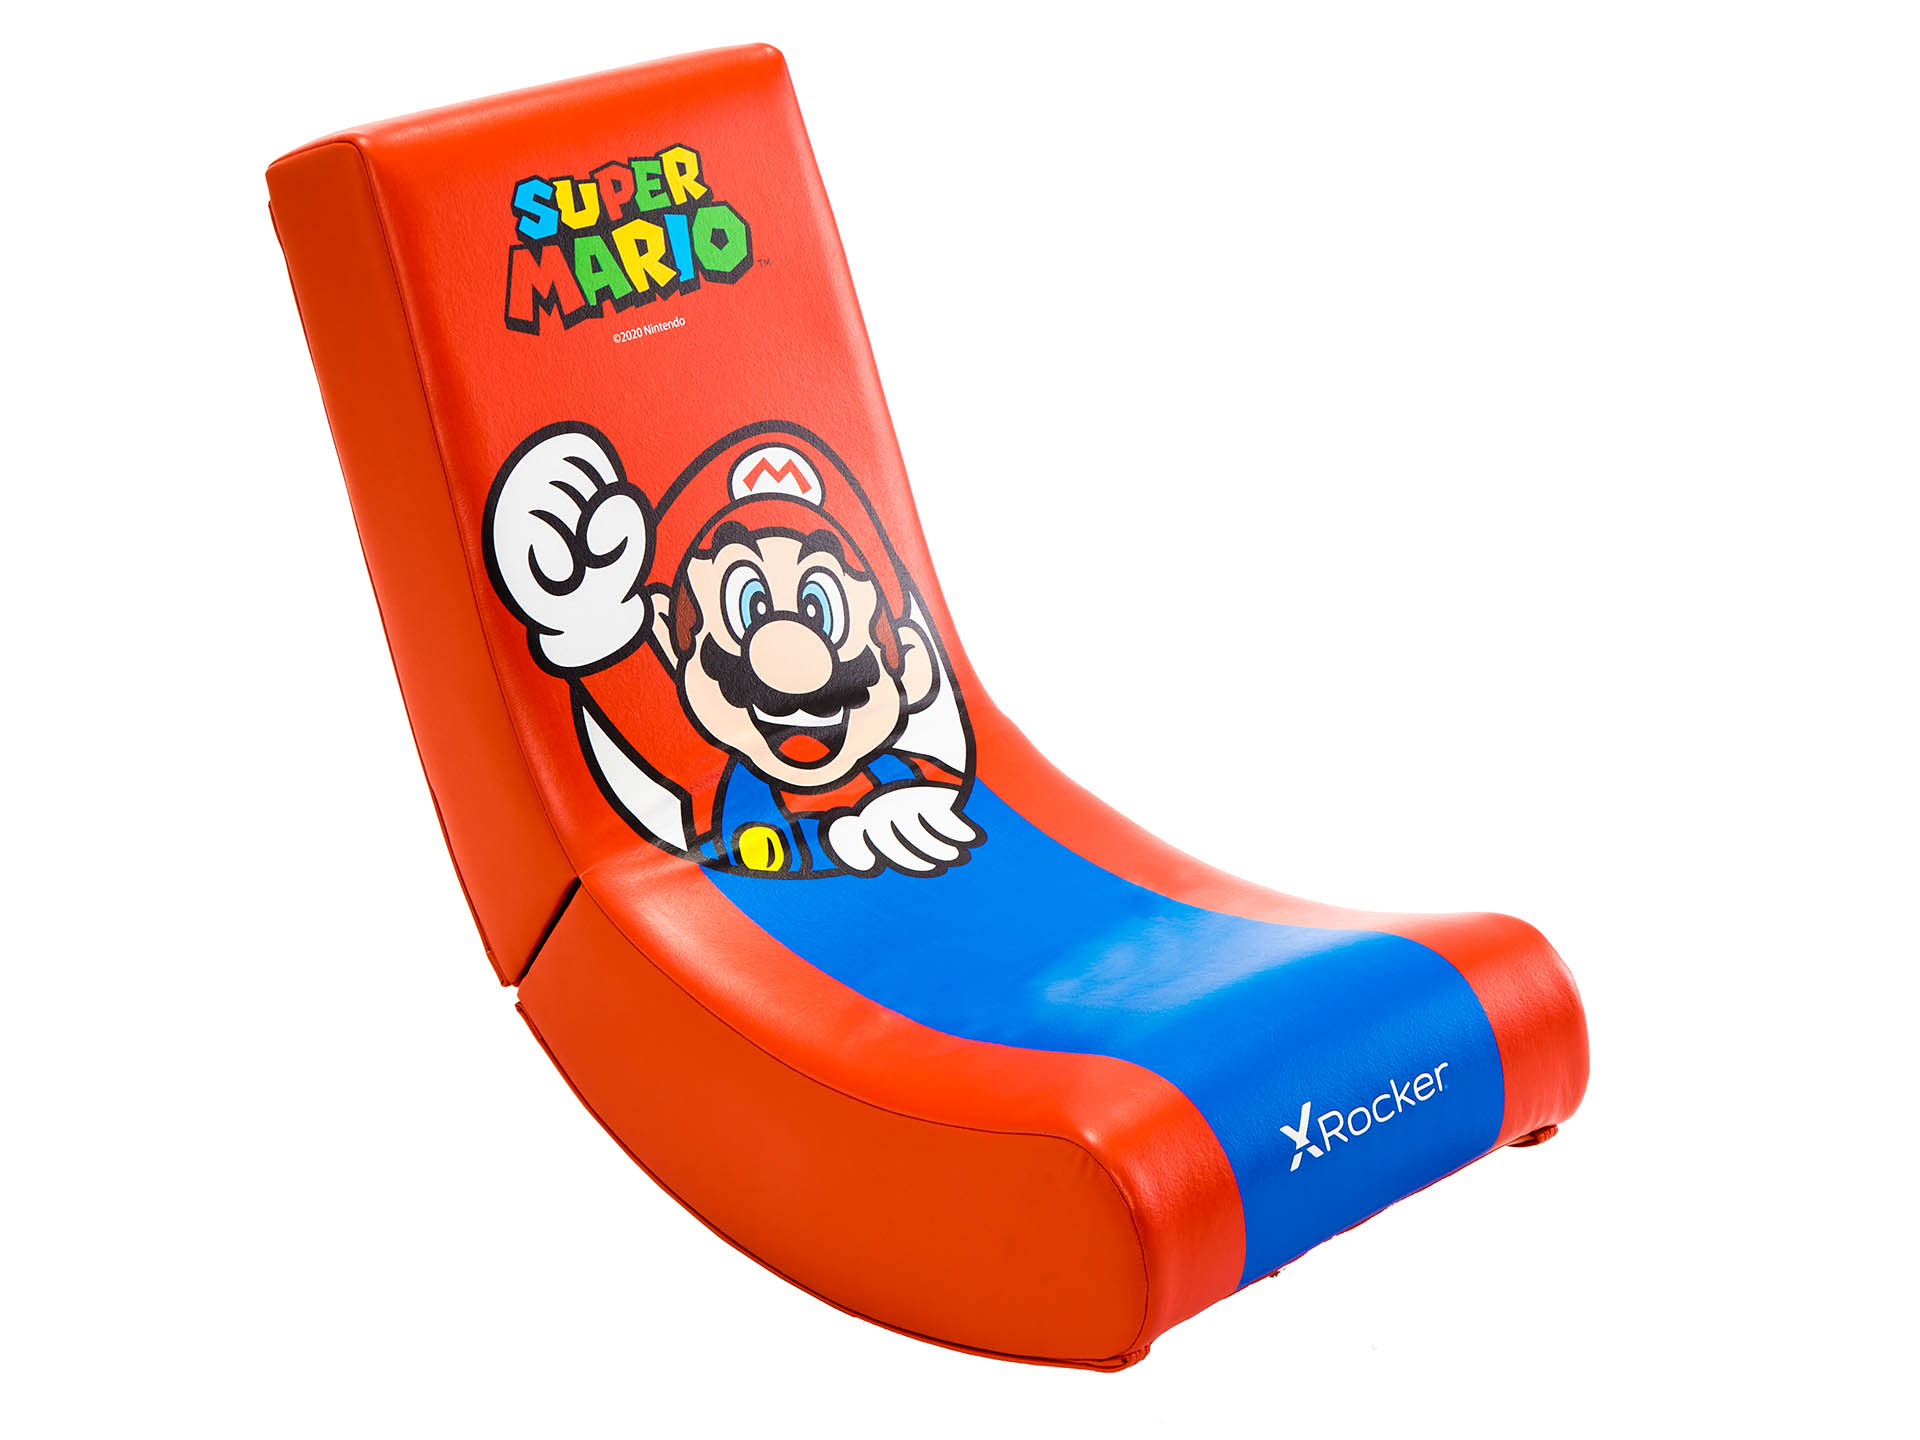 X Rocker Nintendo Gaming Chairs